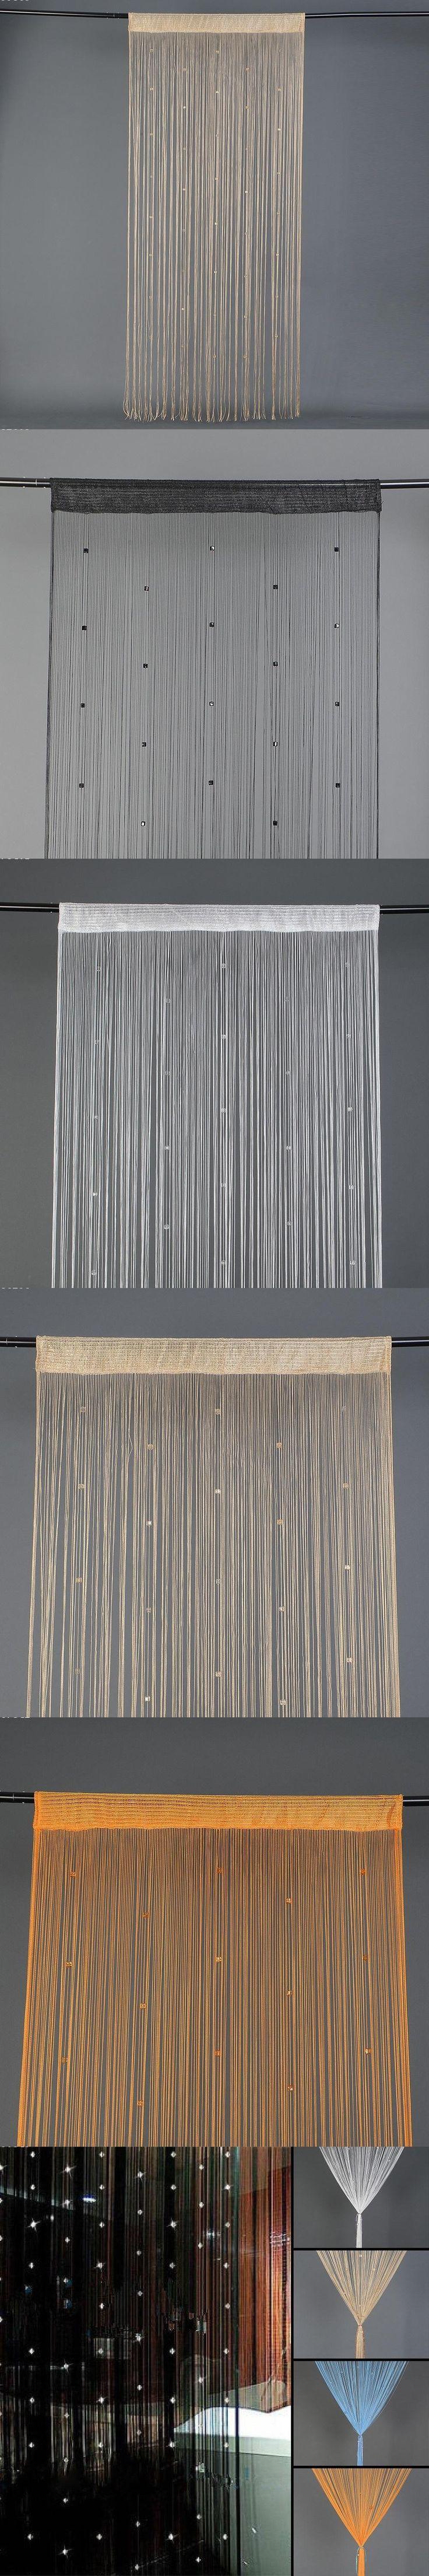 2m*1m Elegant Low-elastic yarn Beaded String Curtain Door Window Curtain Crystal beaded curtain Home decoration L35